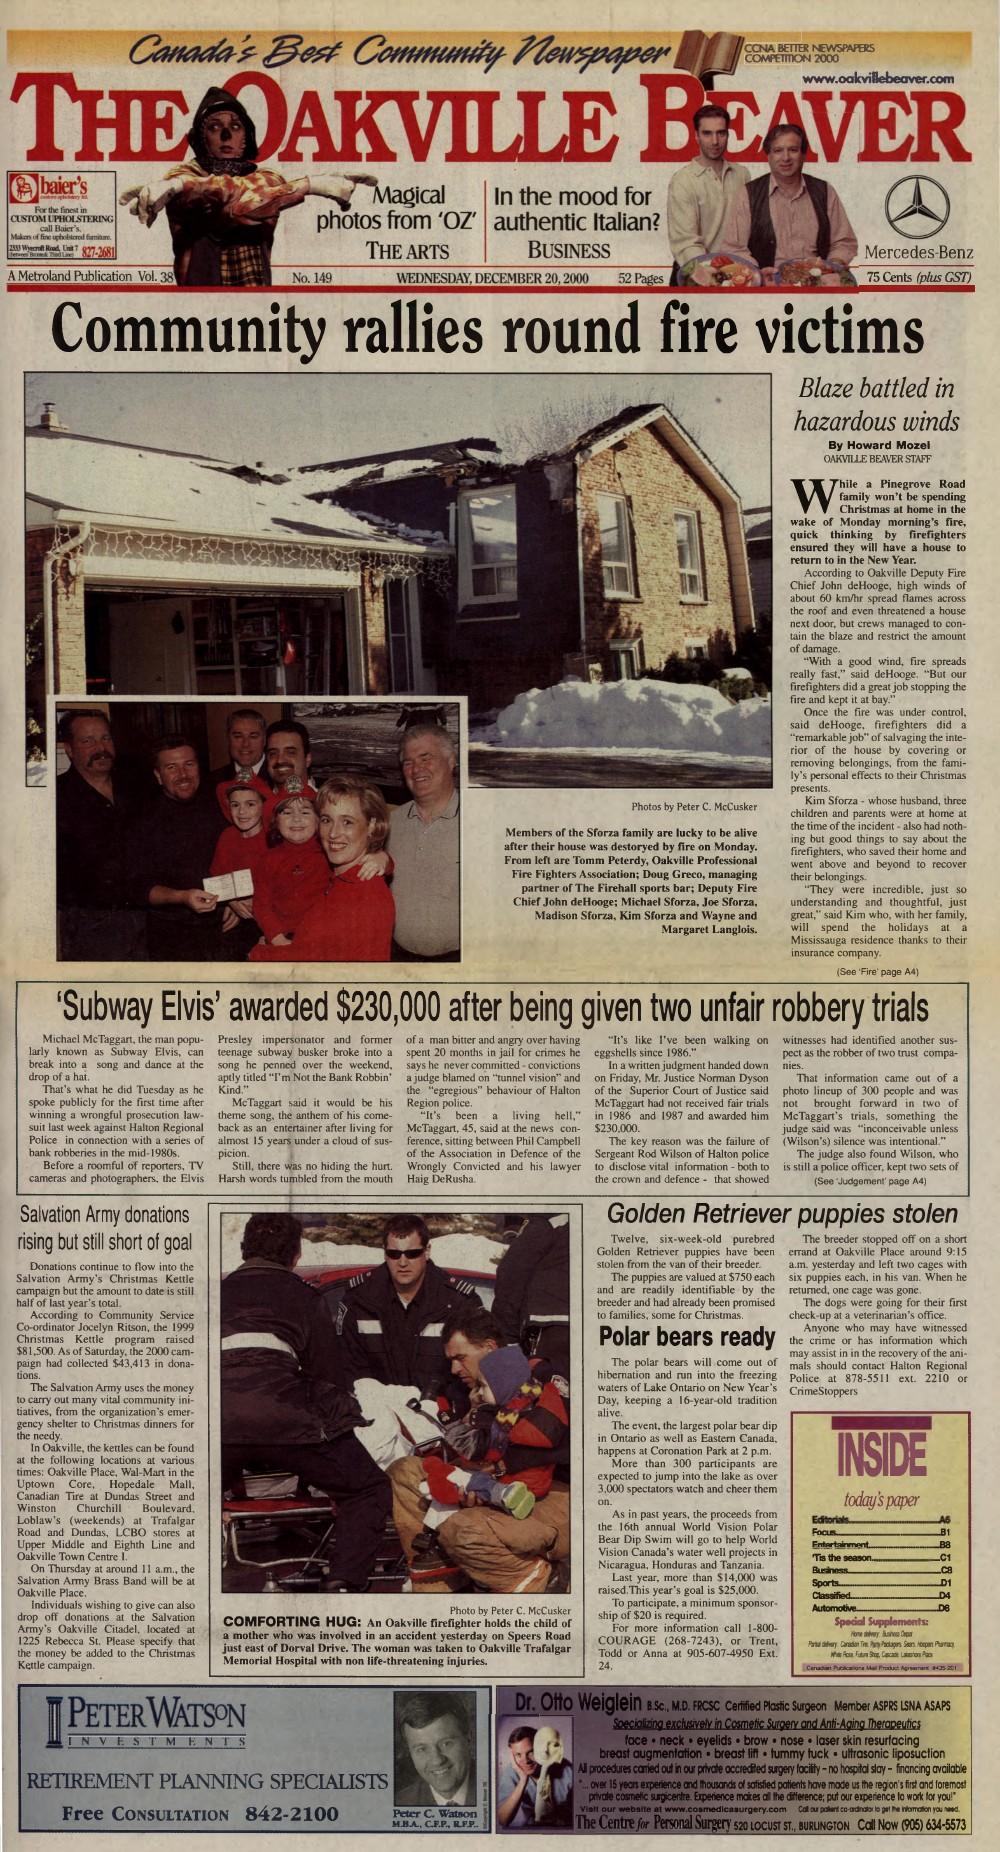 Oakville Beaver, 20 Dec 2000